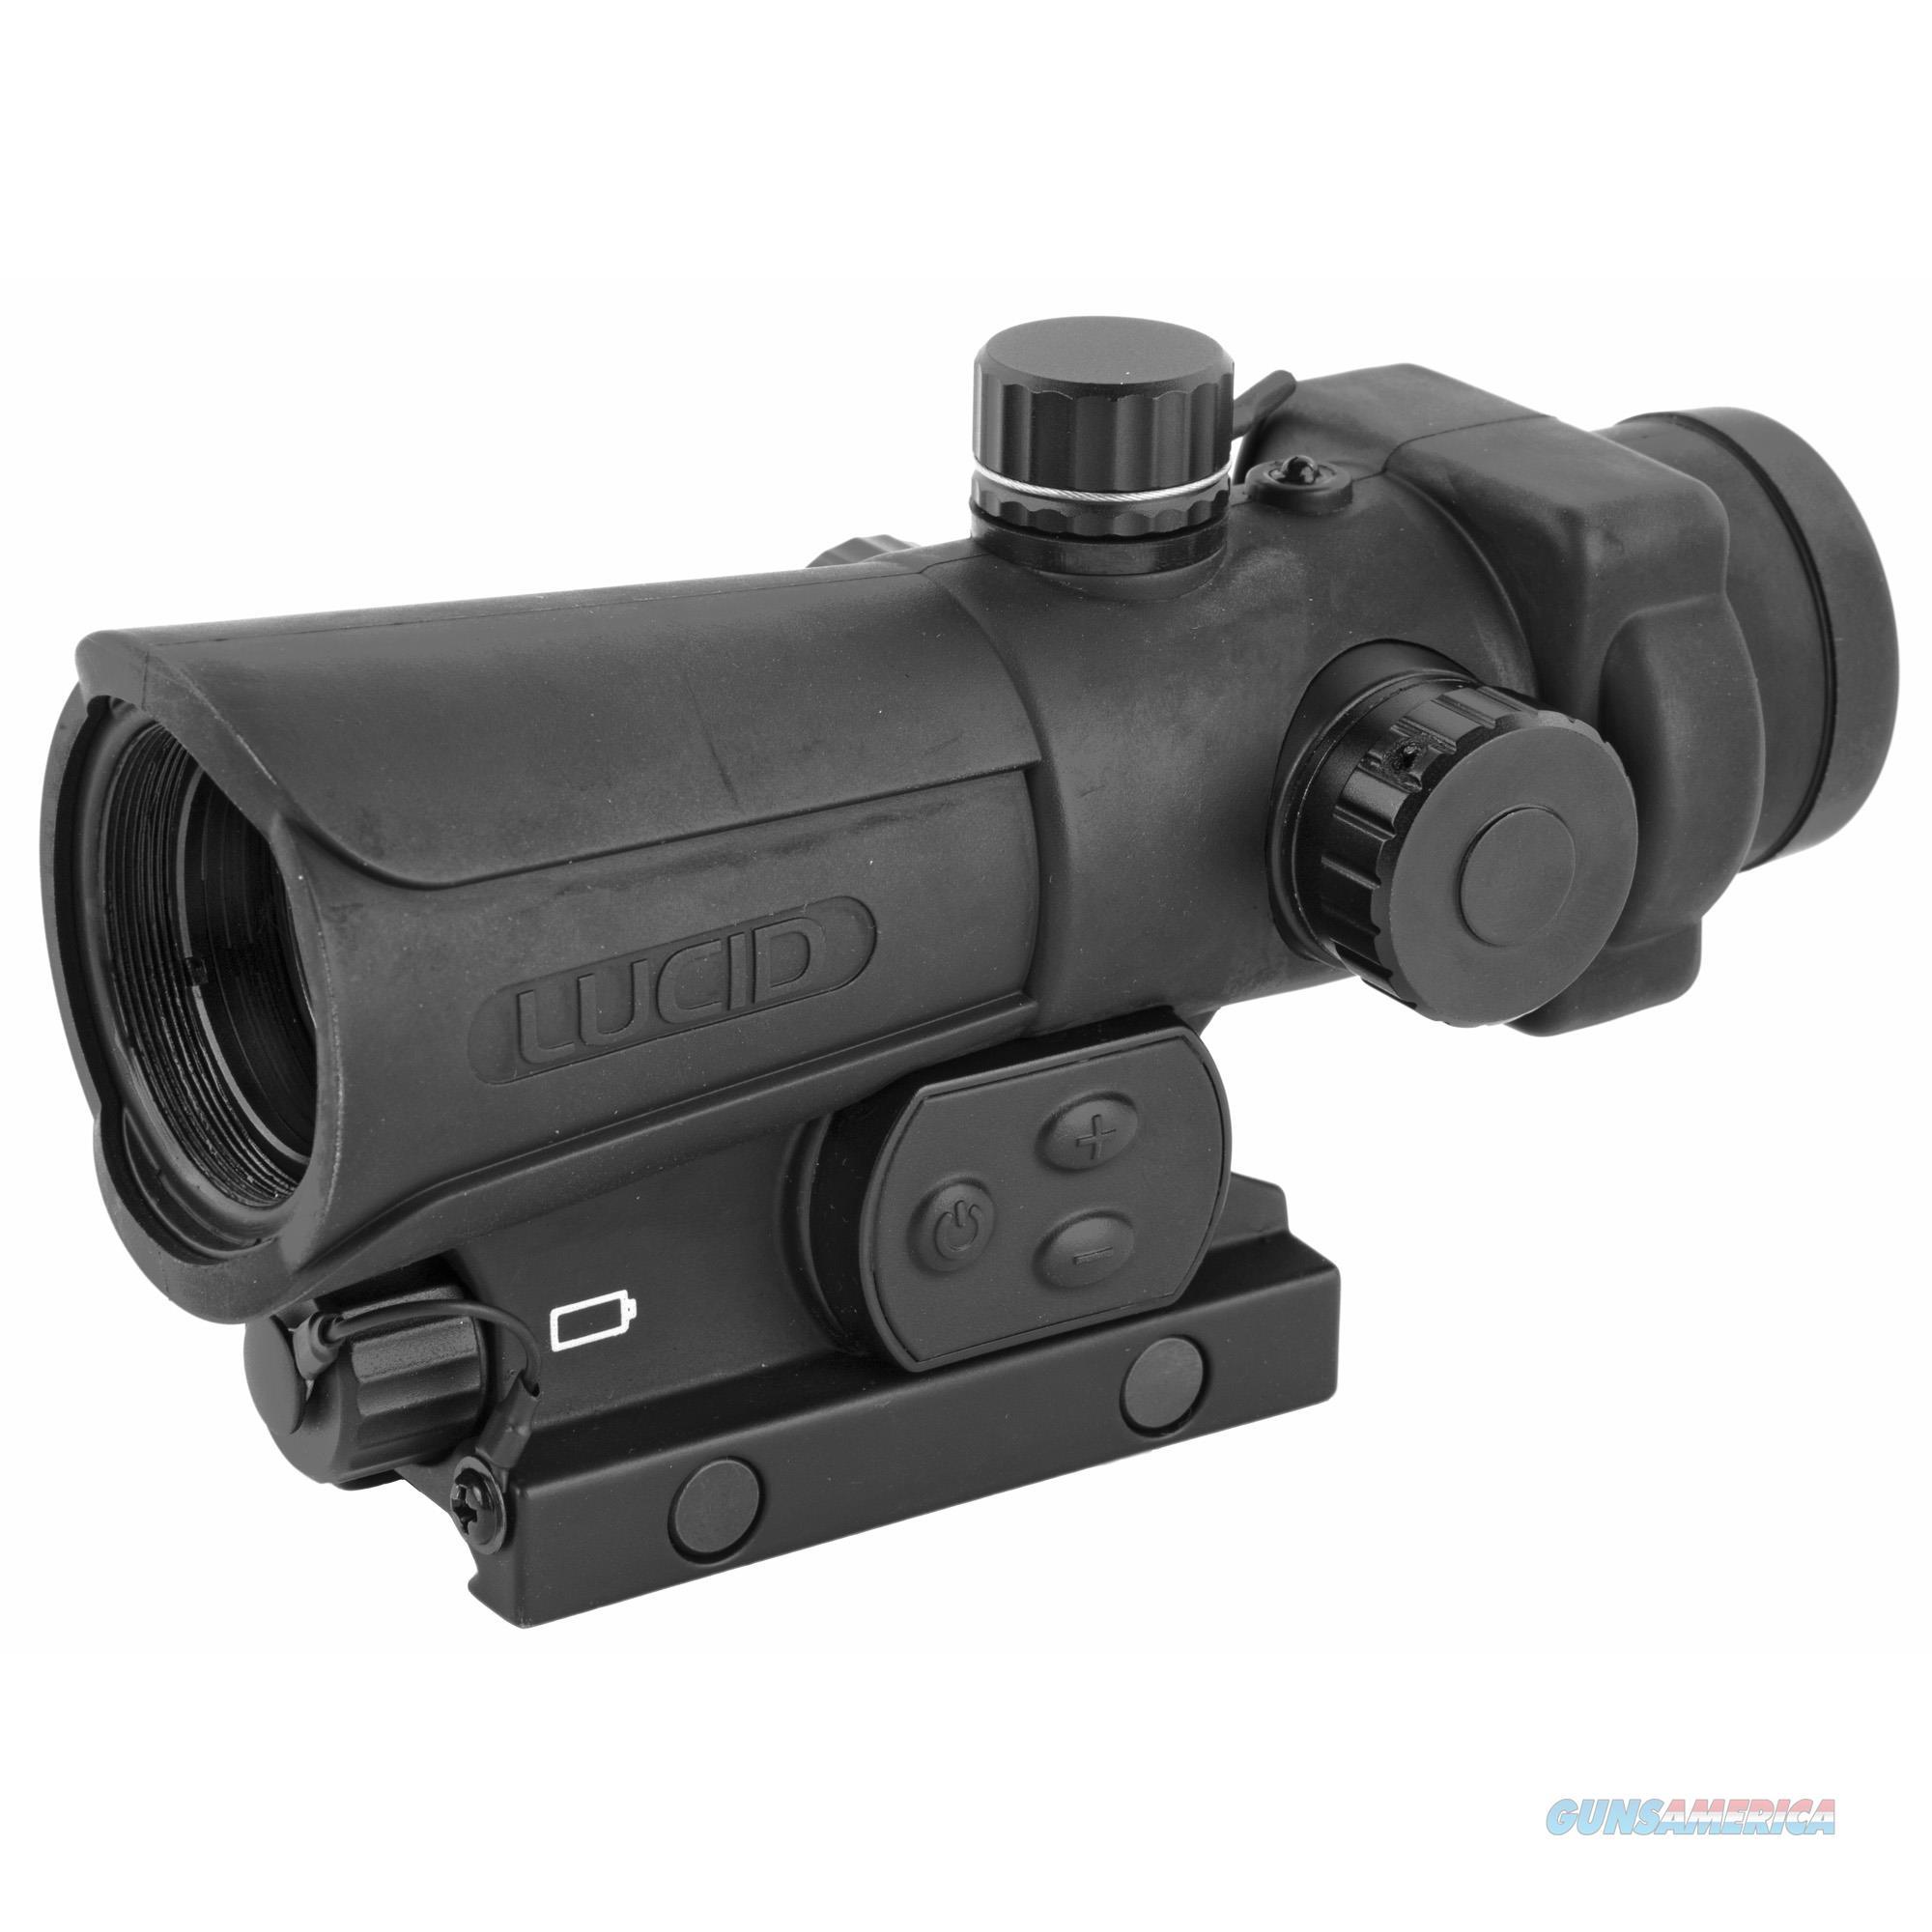 Lucid Optics Red Dot Hd7 - Gen3 34mm Black  Guns > Pistols > 1911 Pistol Copies (non-Colt)